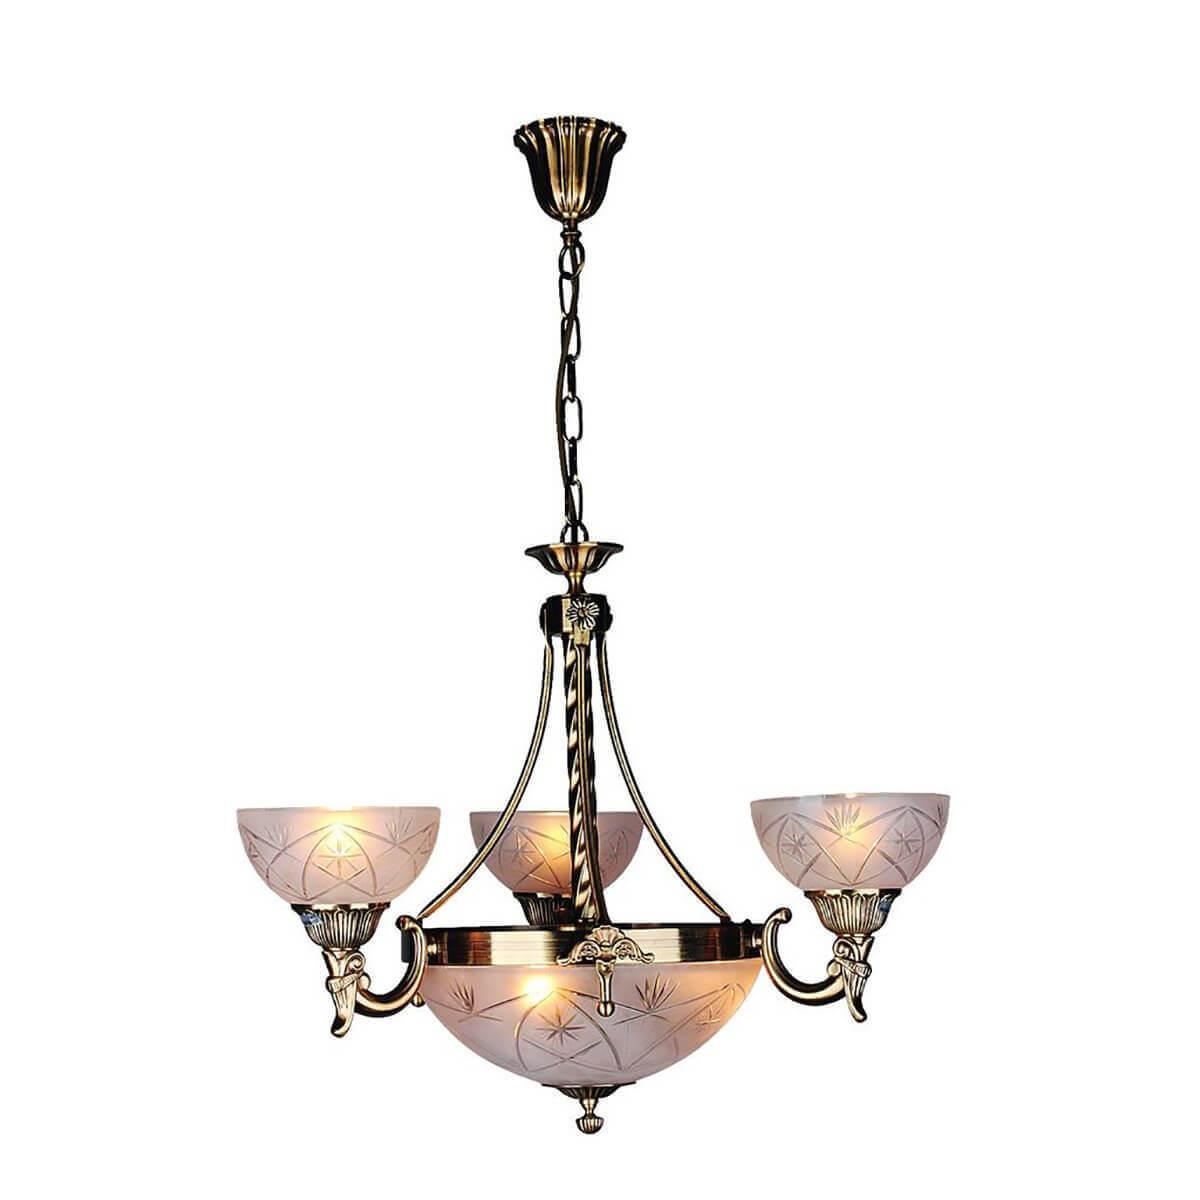 Подвесной светильник Omnilux OML-35023-06, E27, 60 Вт